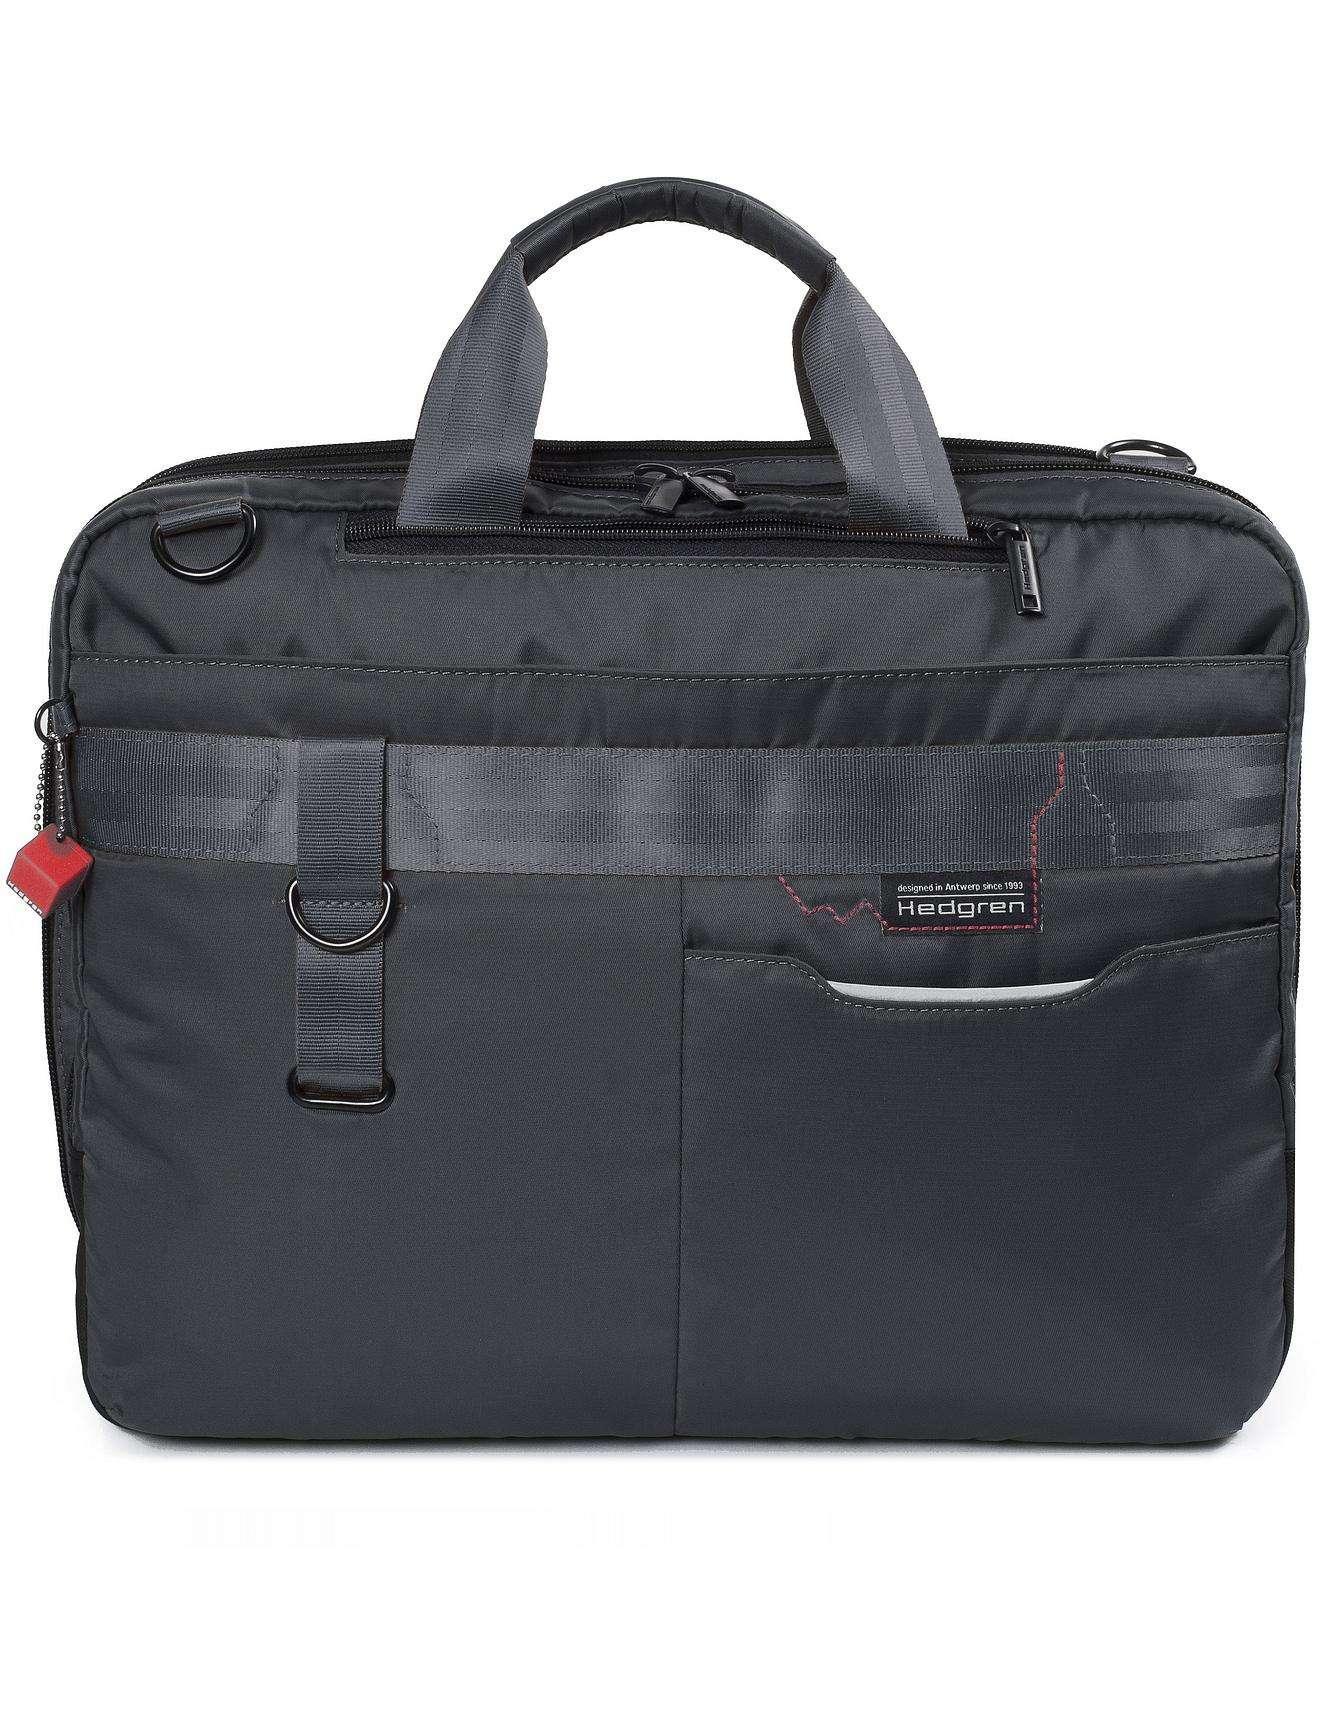 Hedgren The Brook 3 Way Business Bag in Black for Men - Lyst f6965a758b